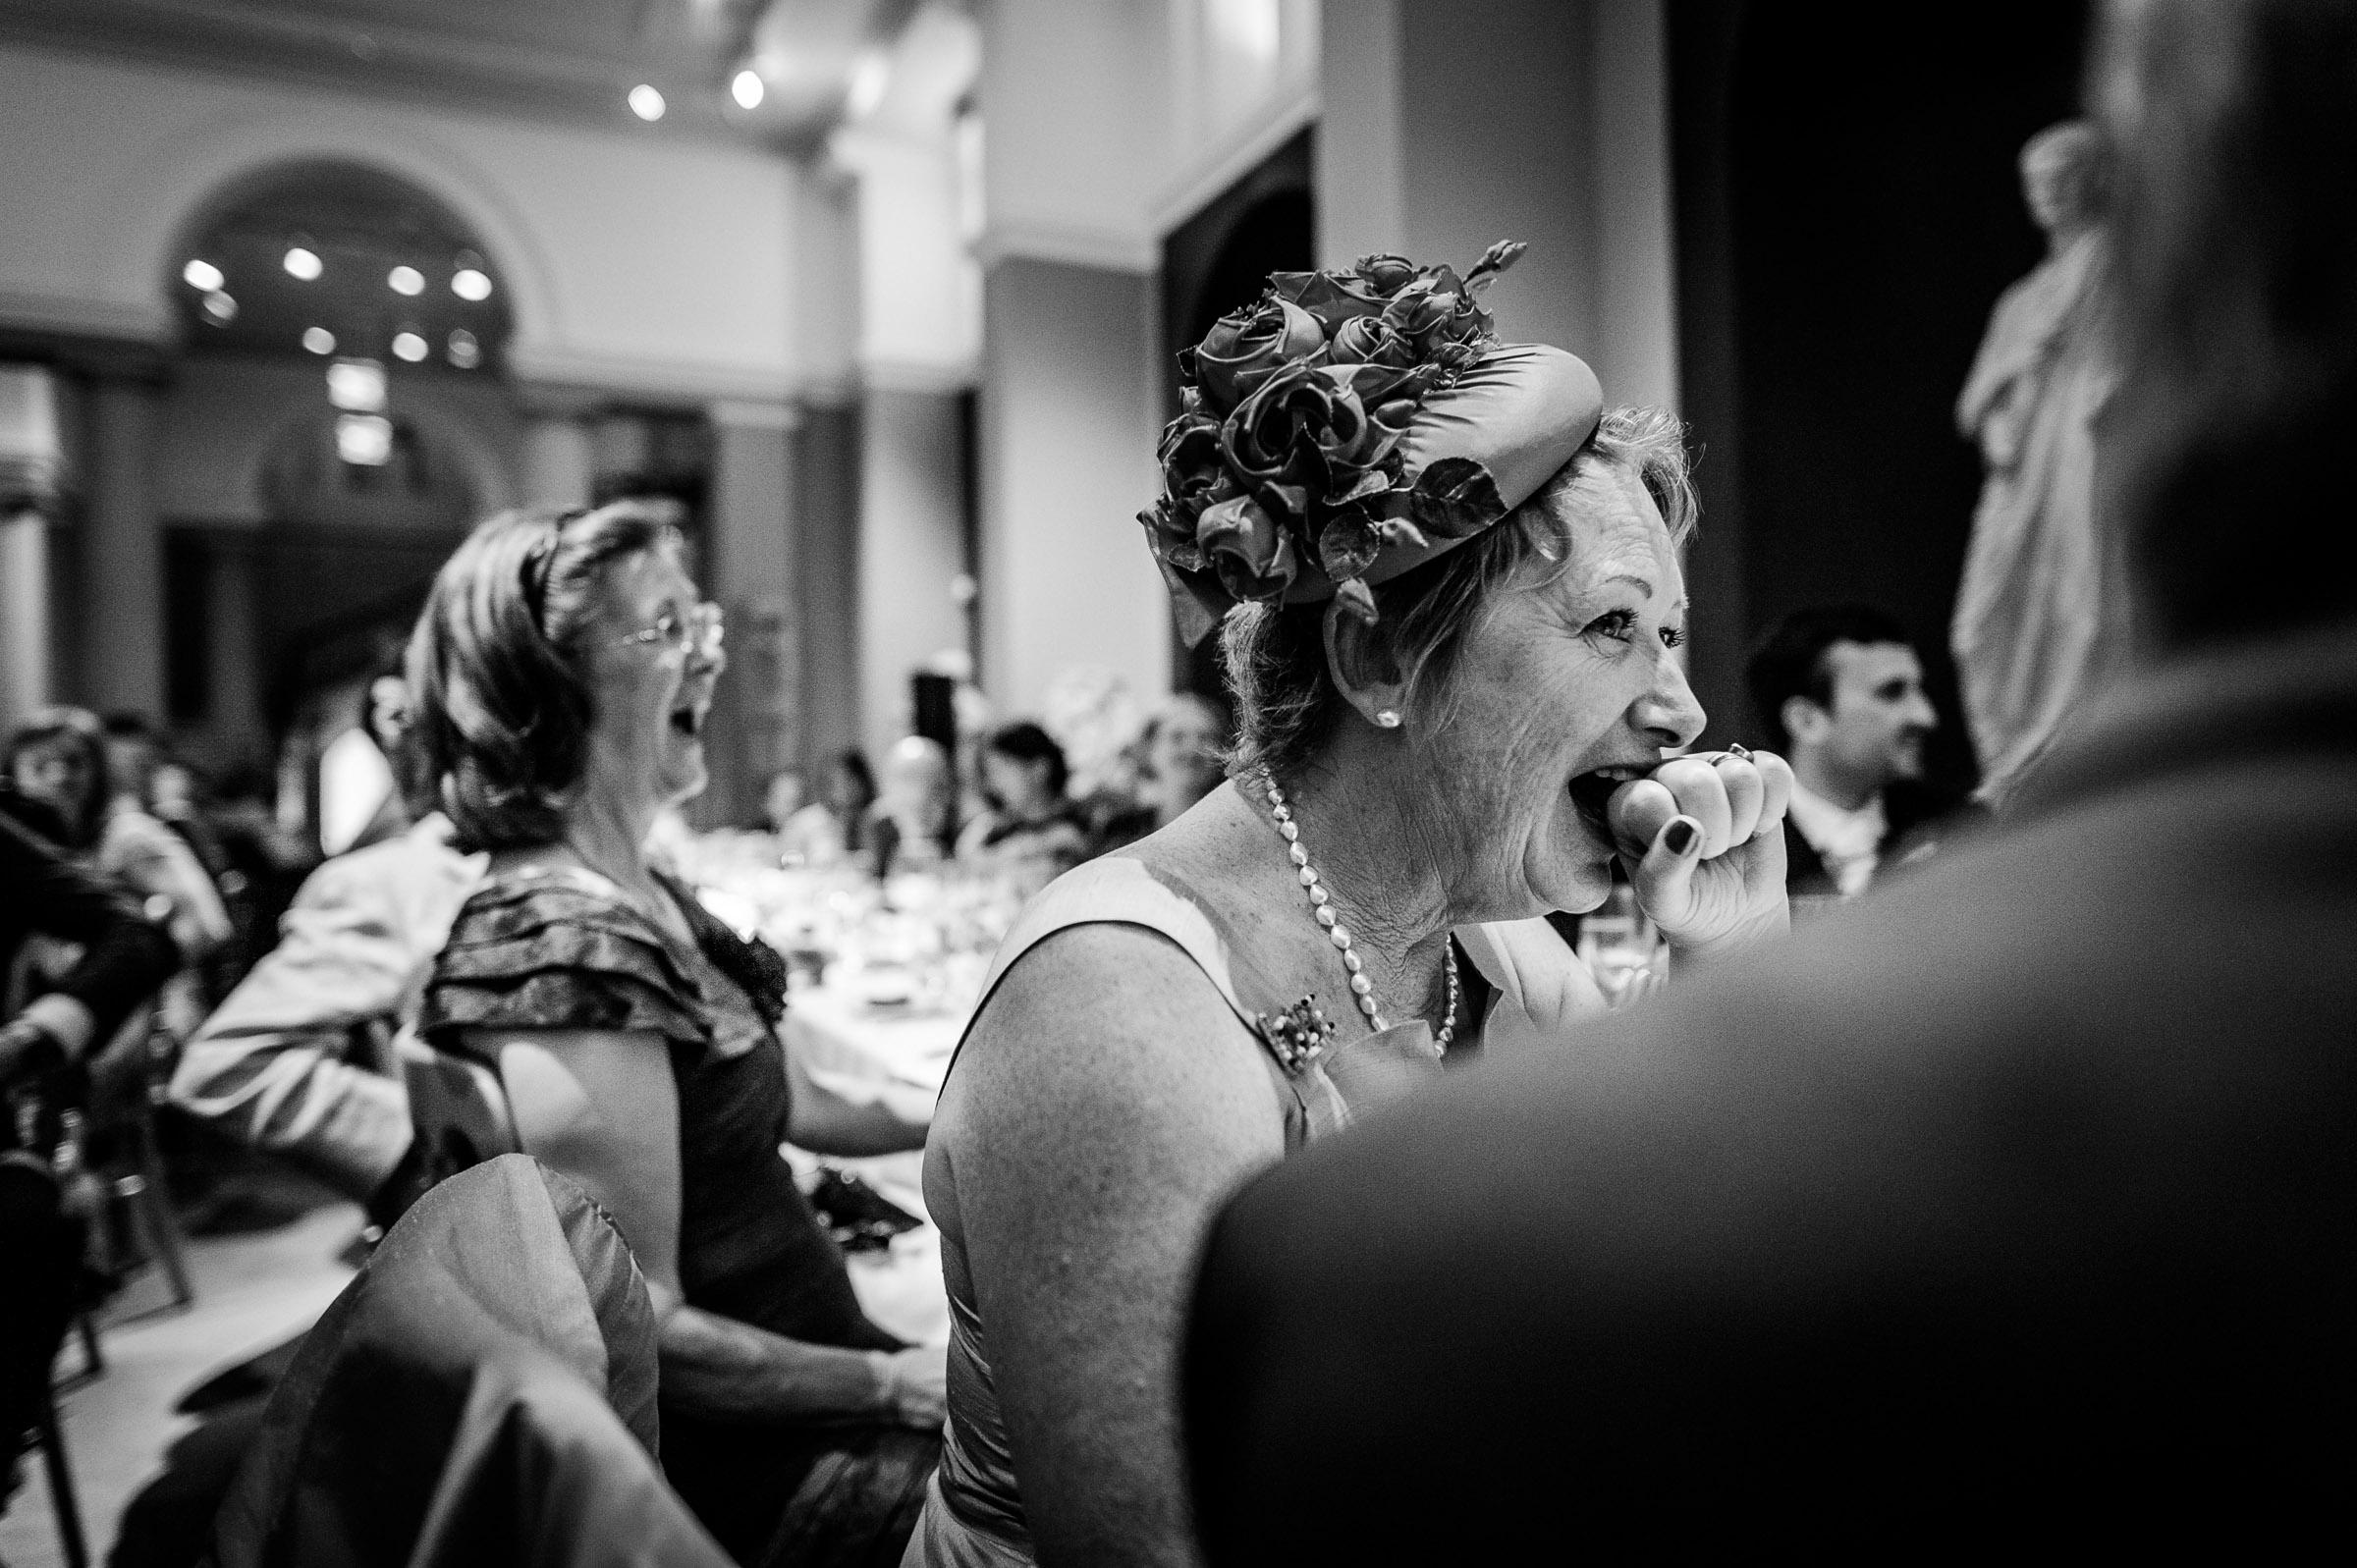 Ashmolean-Museum-Wedding-Pictures-0065.jpg